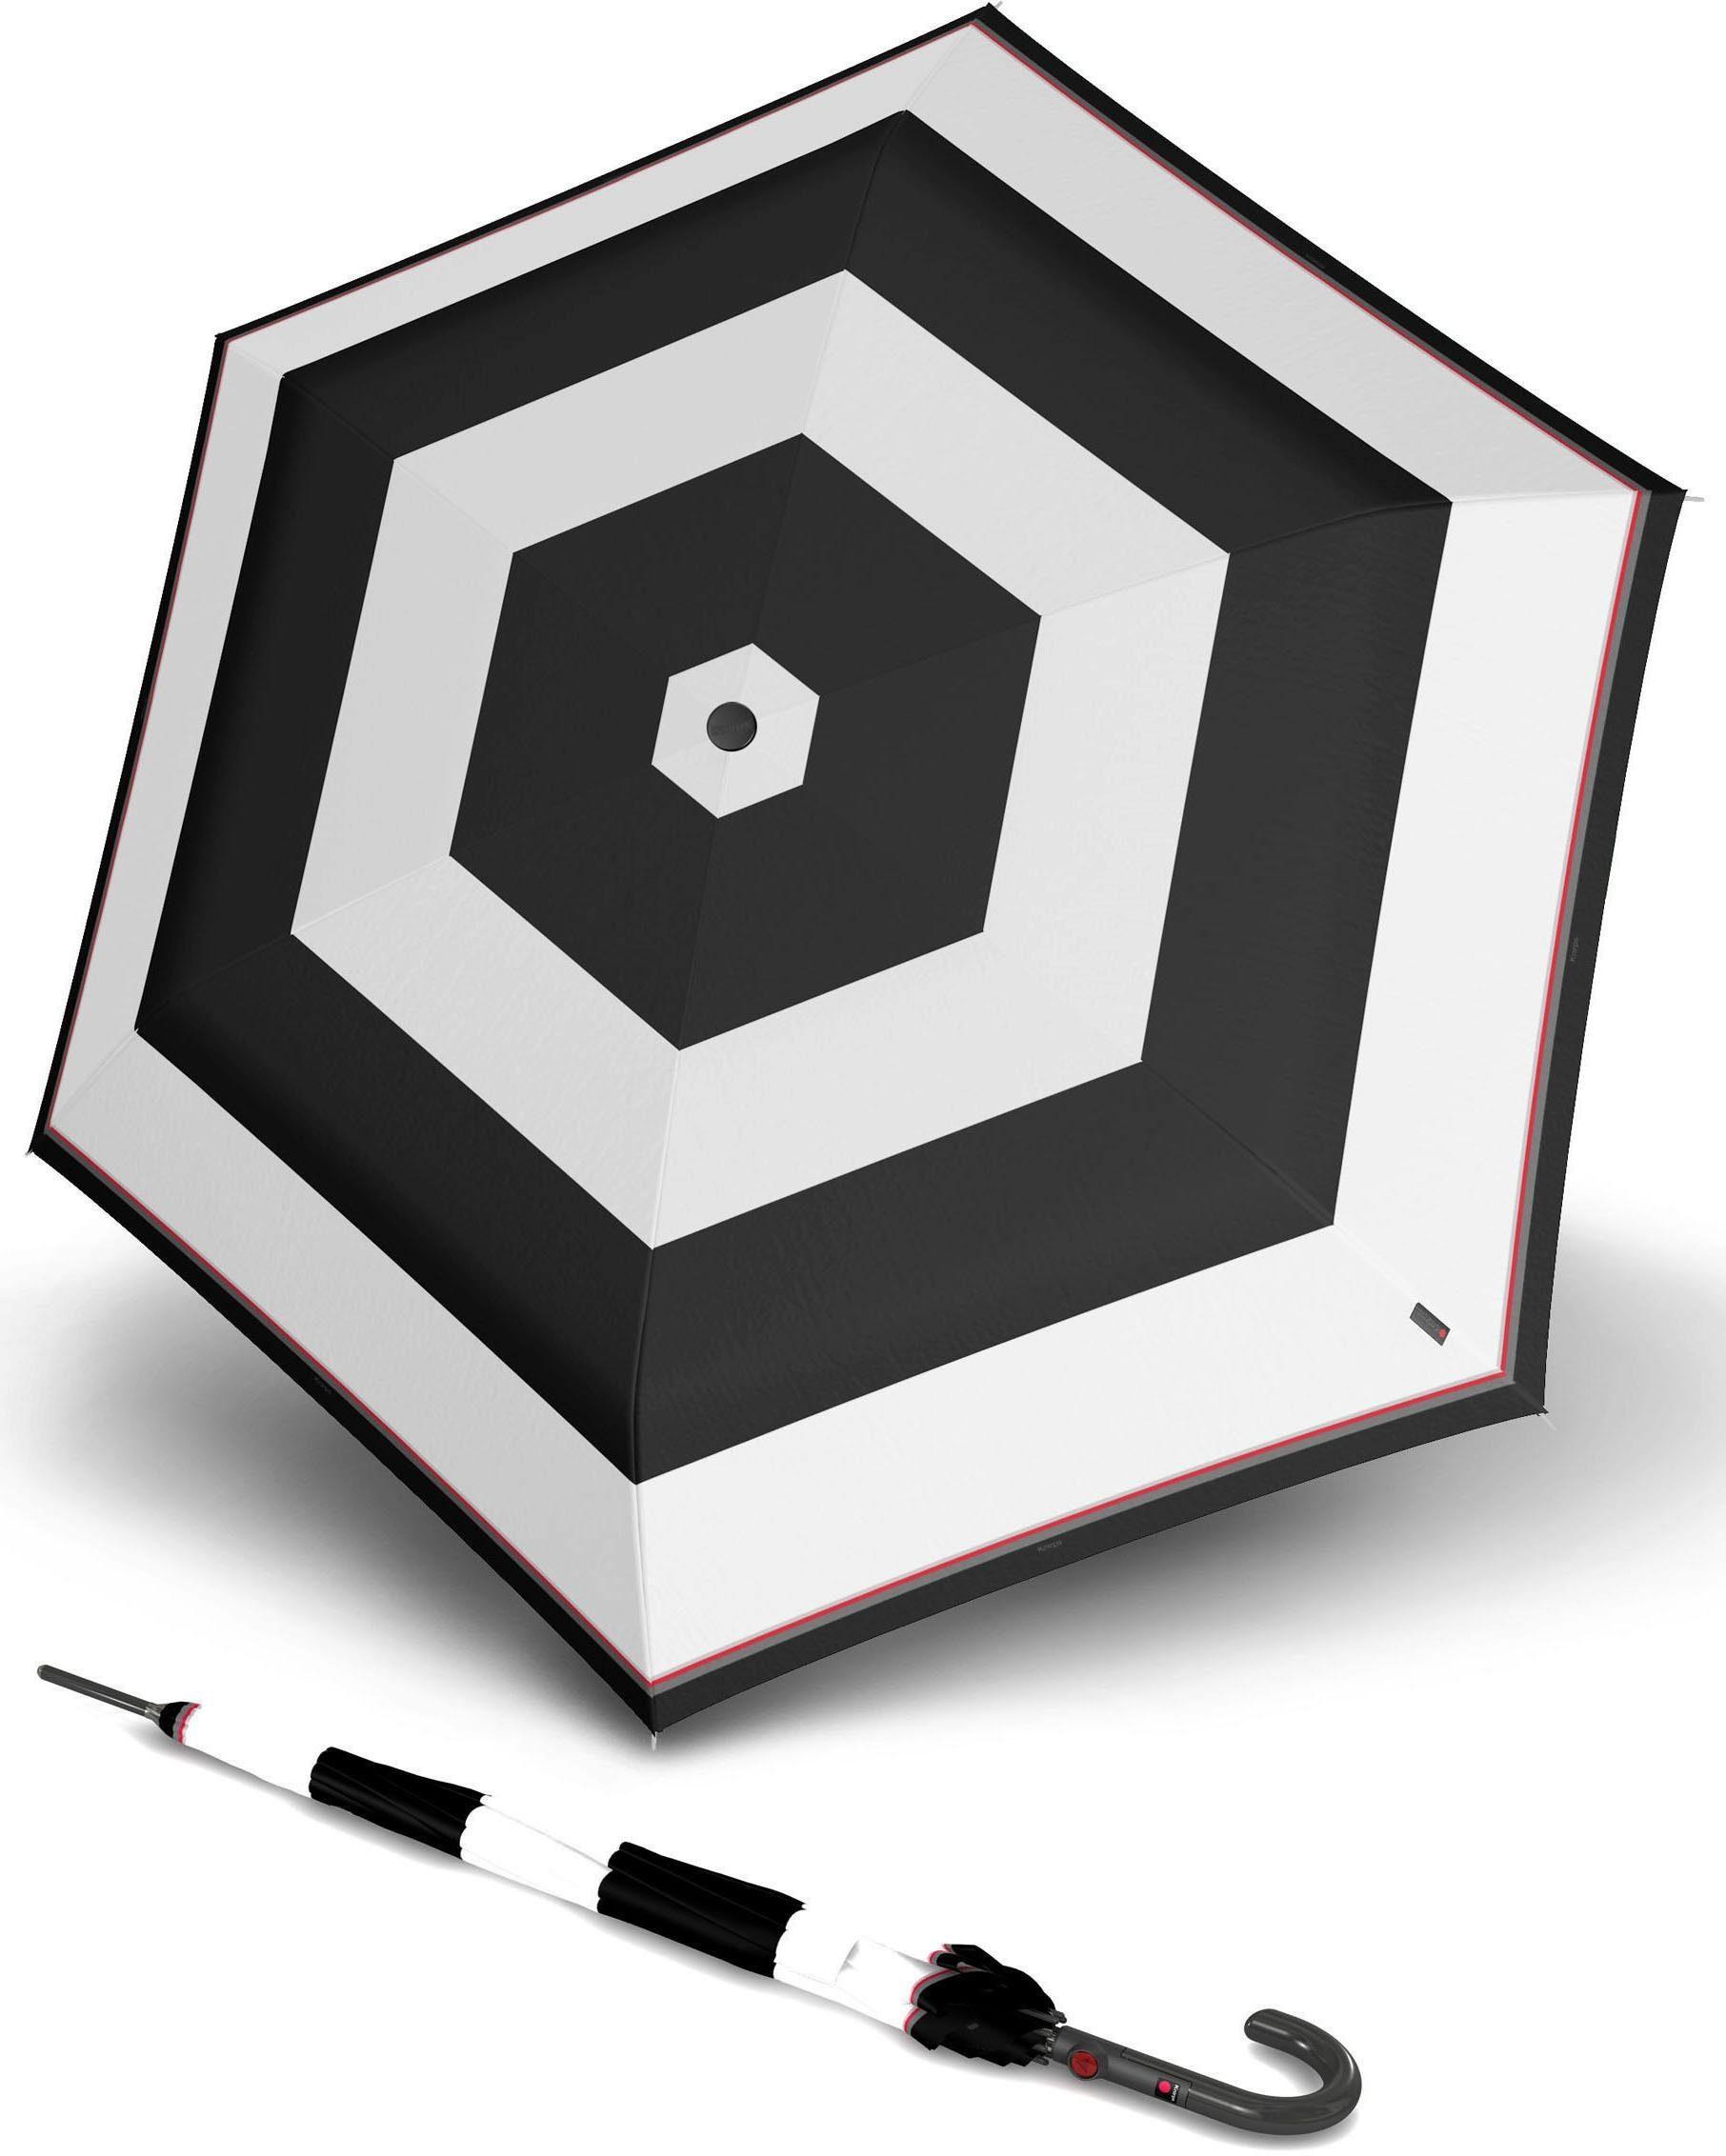 Knirps® Regenschirm - Langschirm, »T.703 Stick Automatic ID stripe«